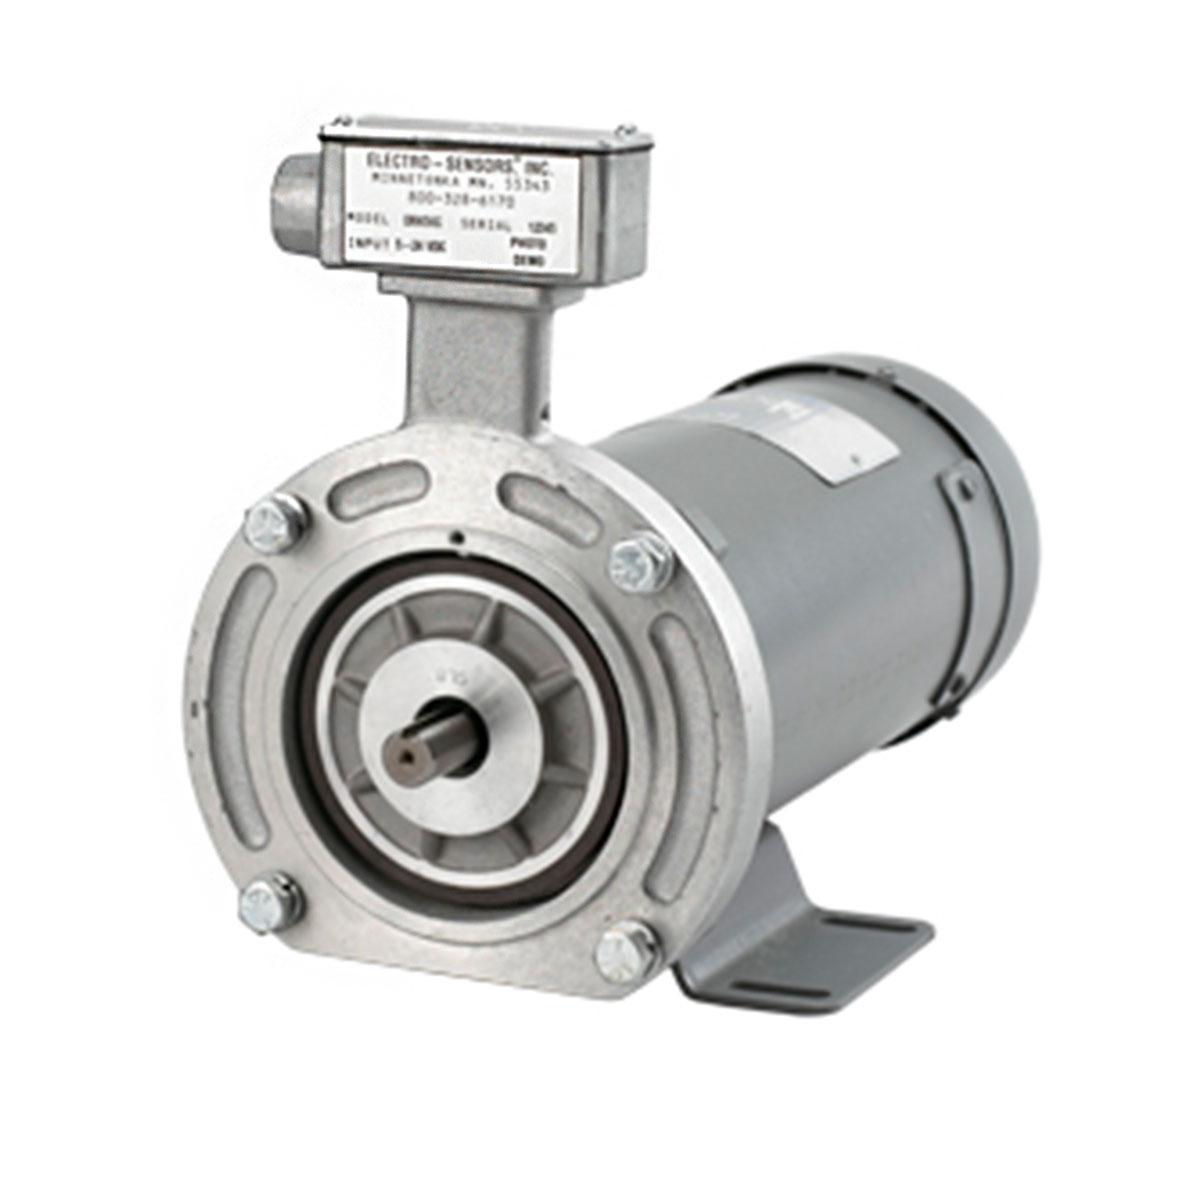 Electro-Sensors_DRK143TC_BHD